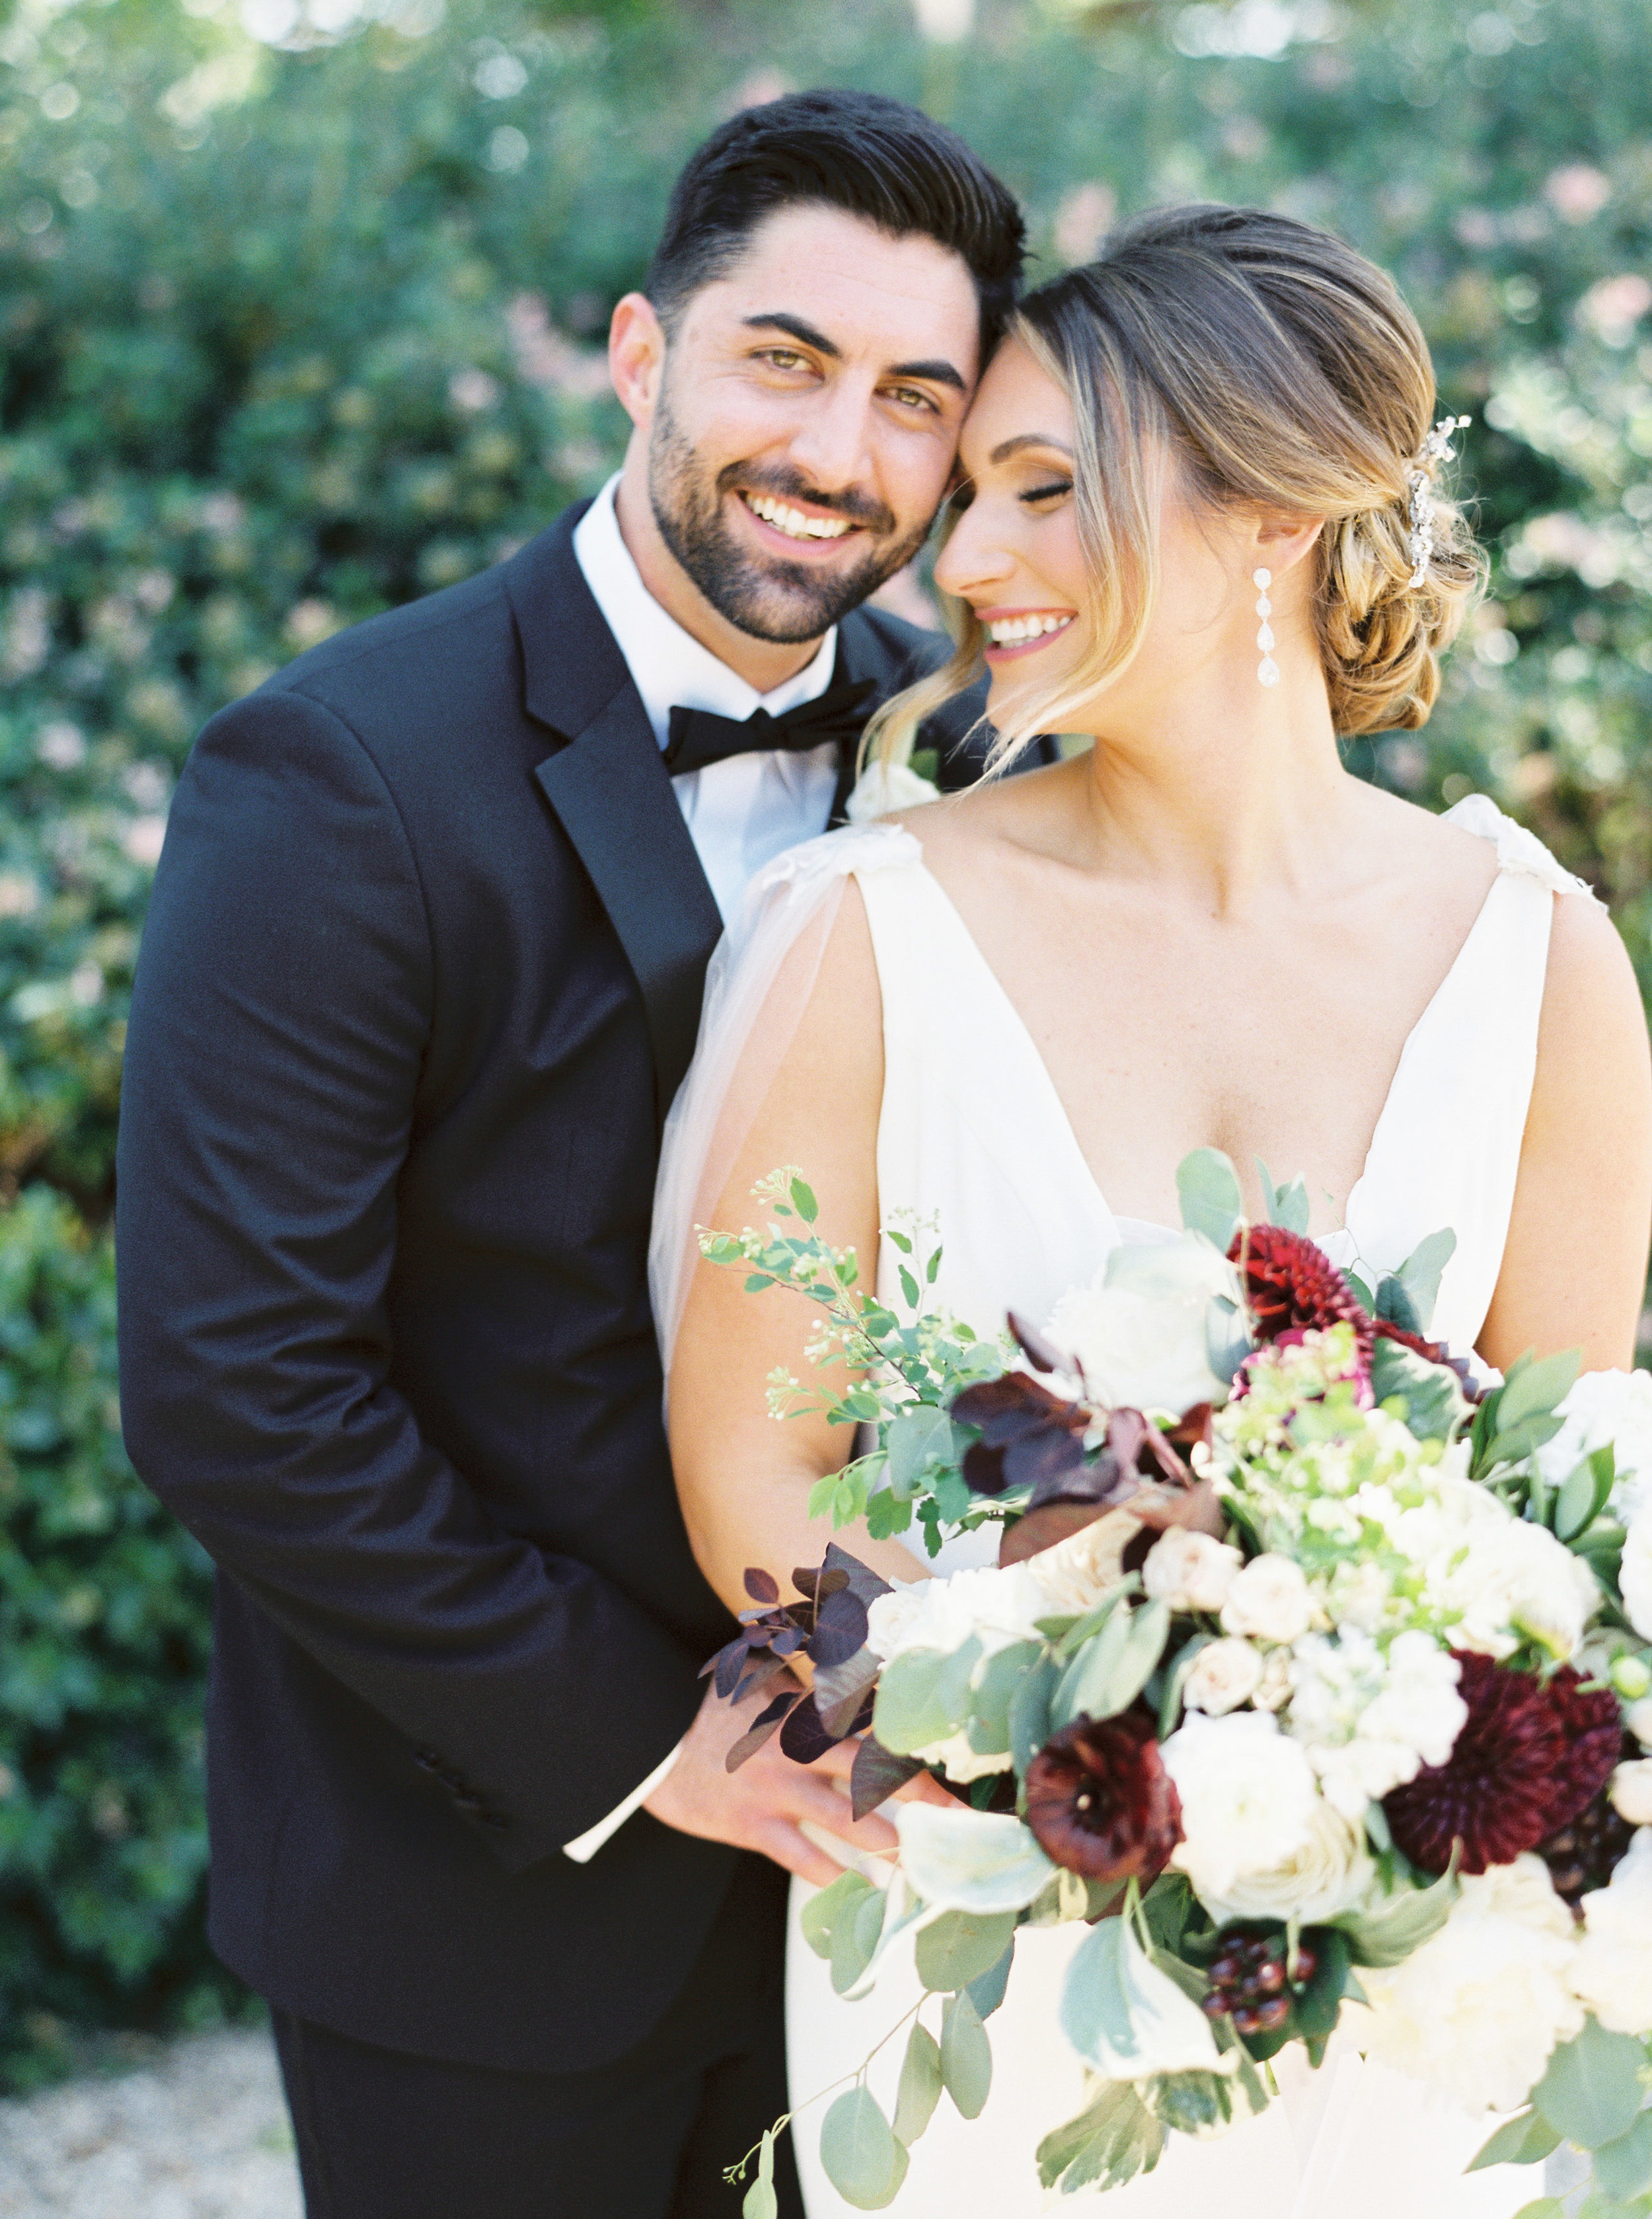 vintners-inn-wedding-in-santa-rosa-california-192.jpg